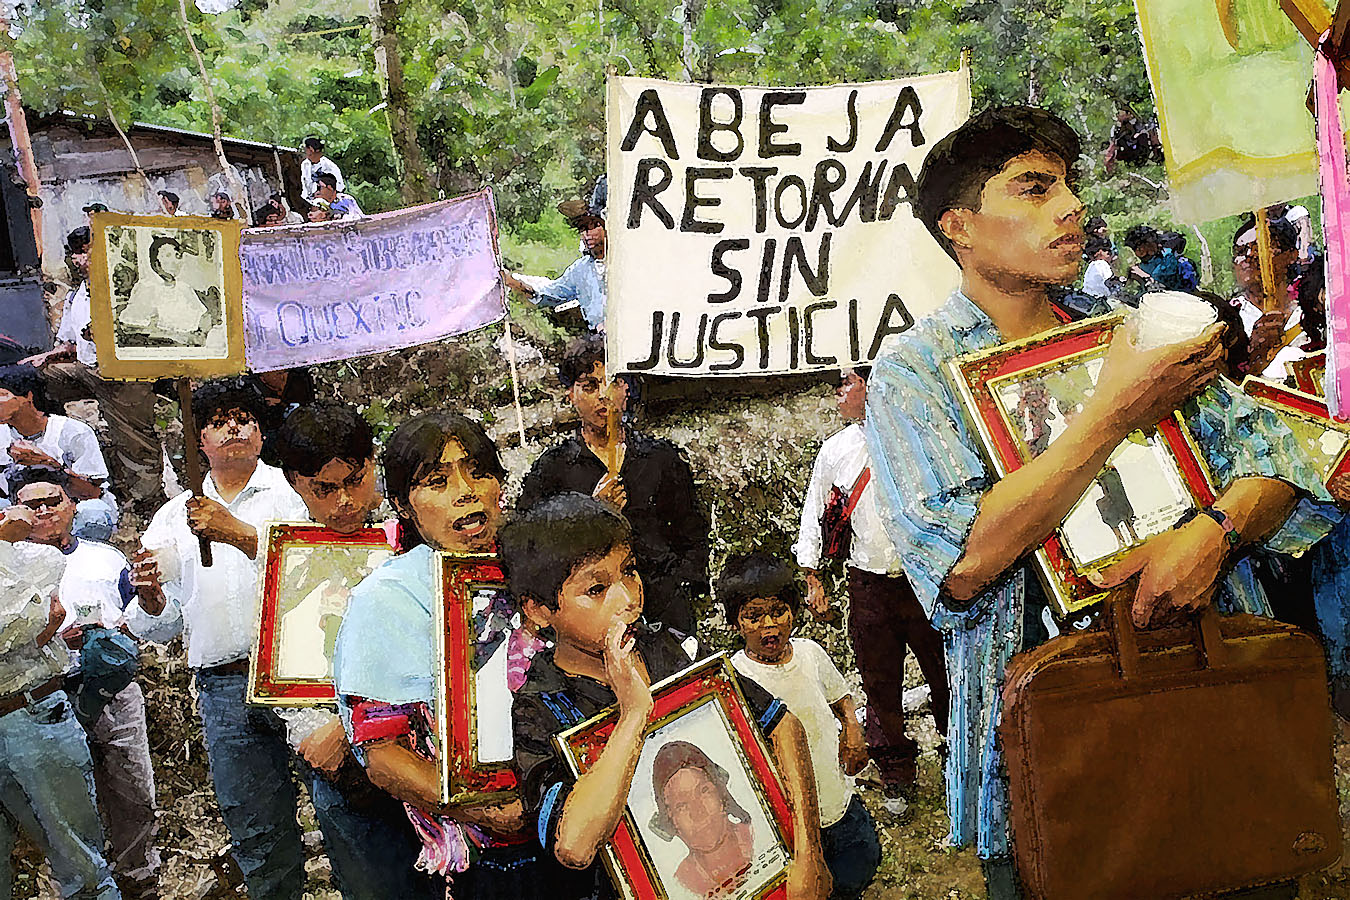 Quextic sin justicia, 2001